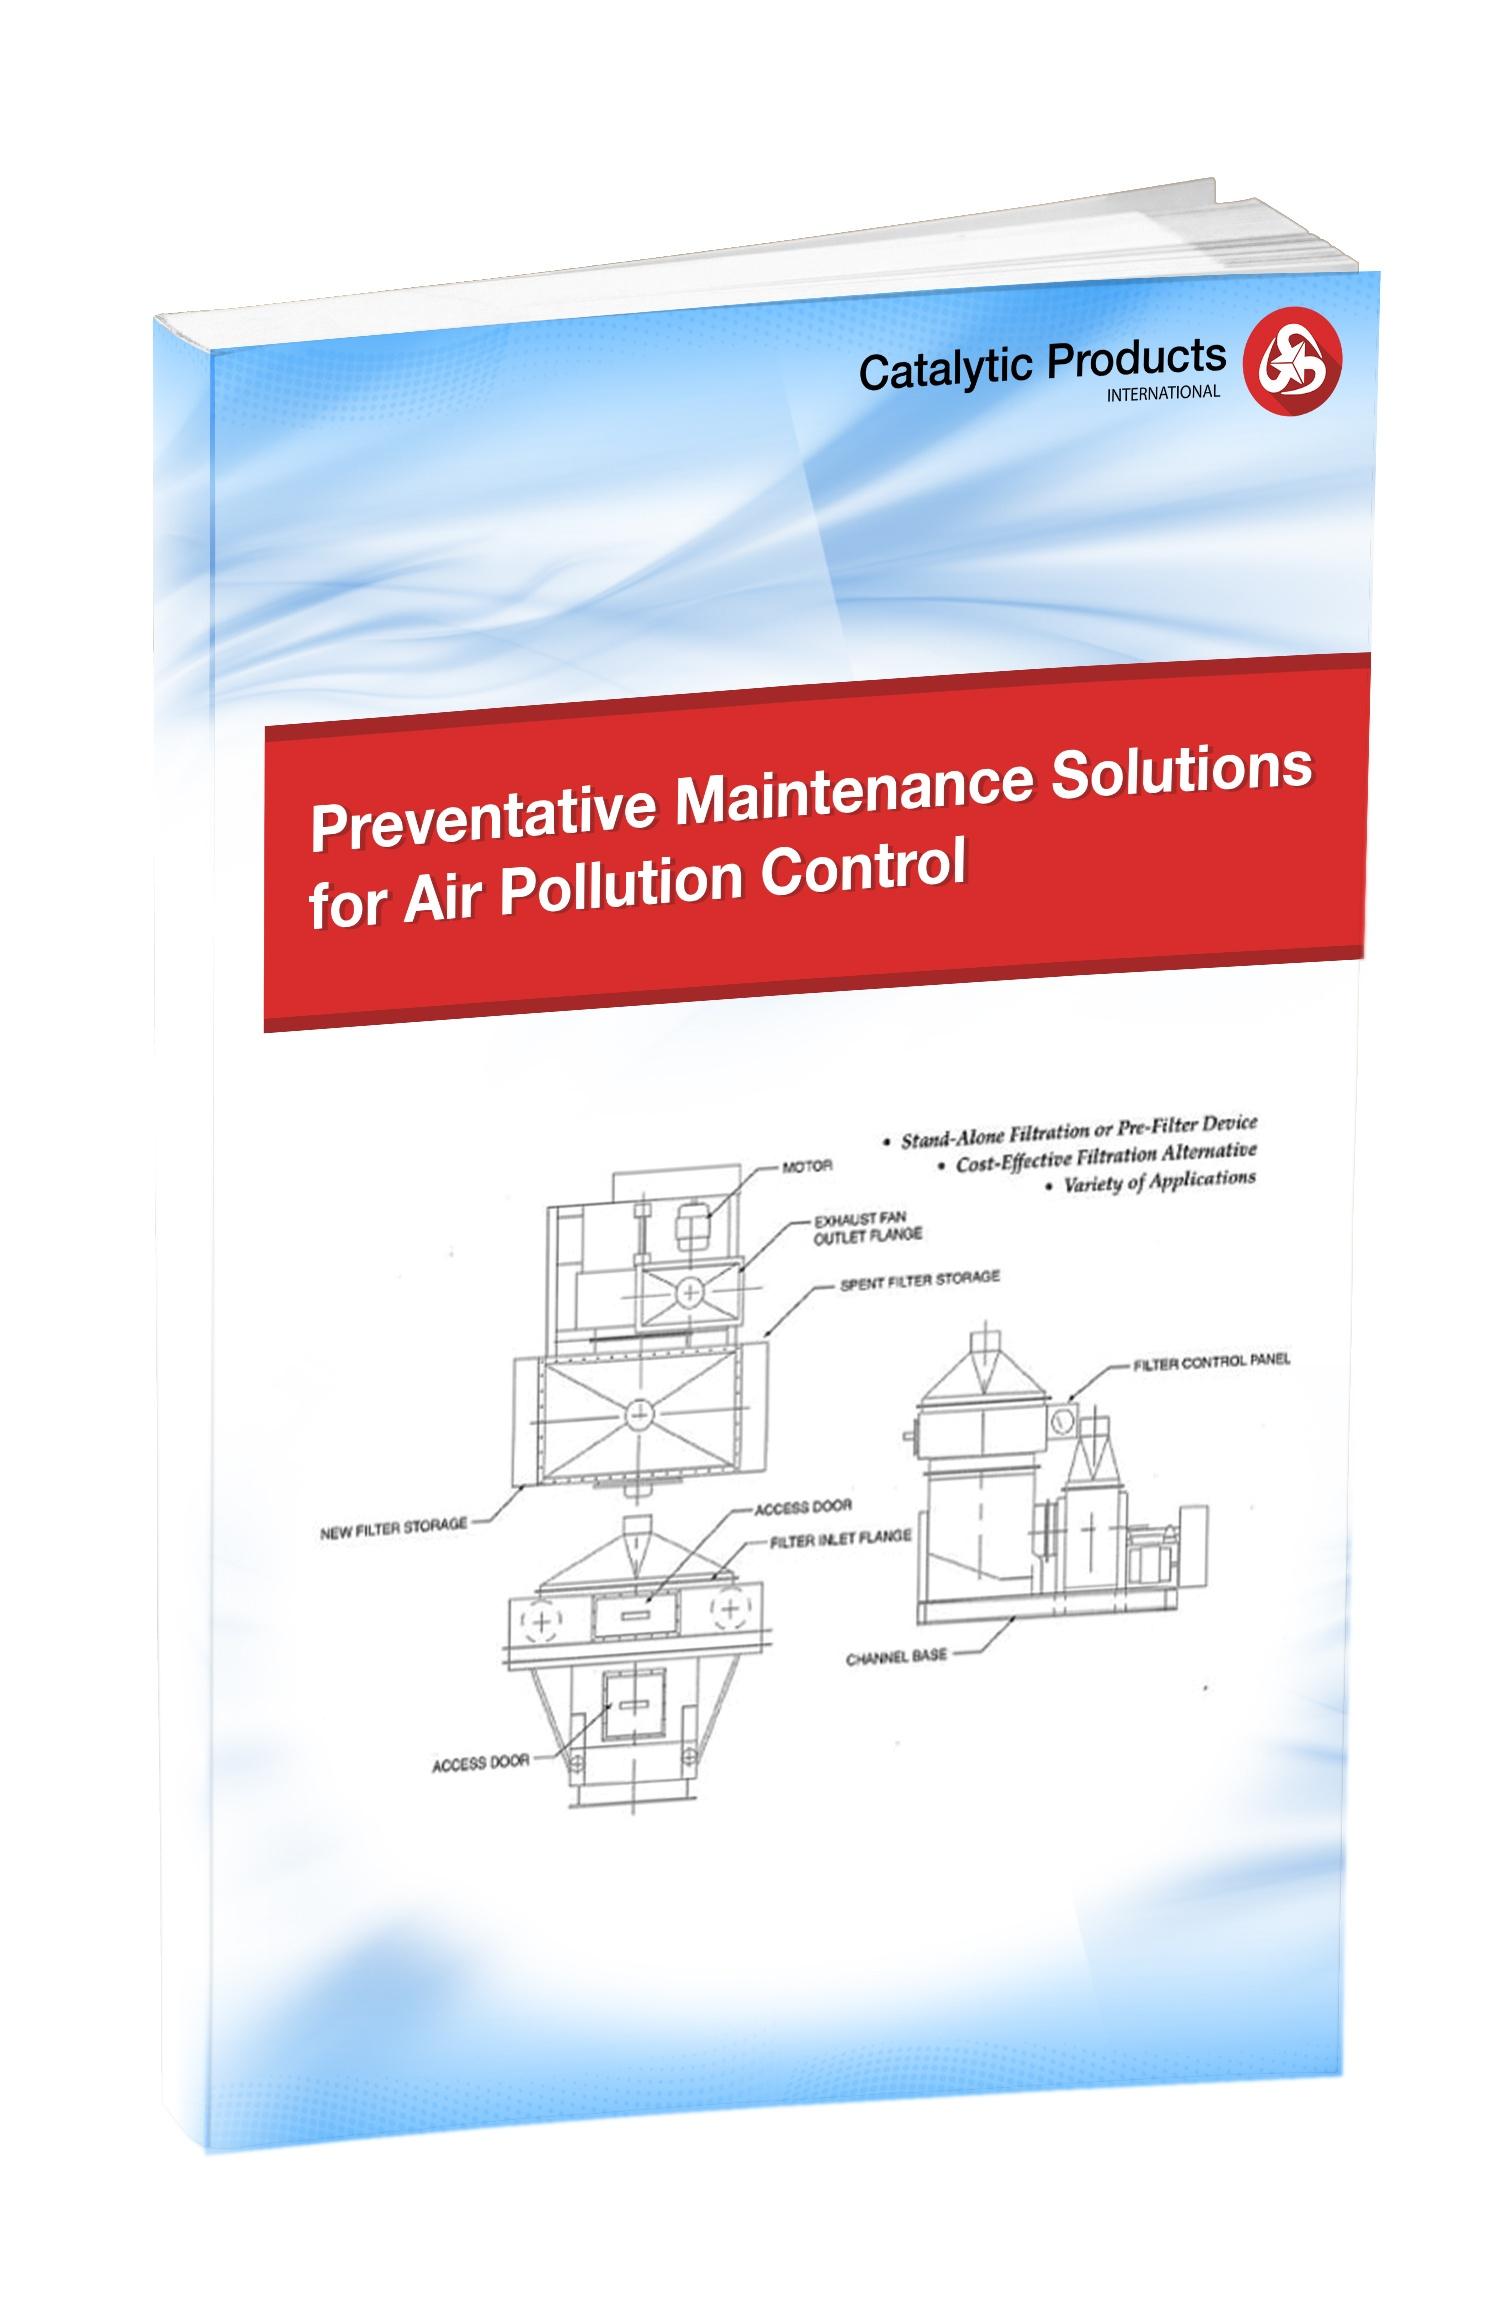 Preventative-Maintenance-Solutions-eBook-2015.jpg